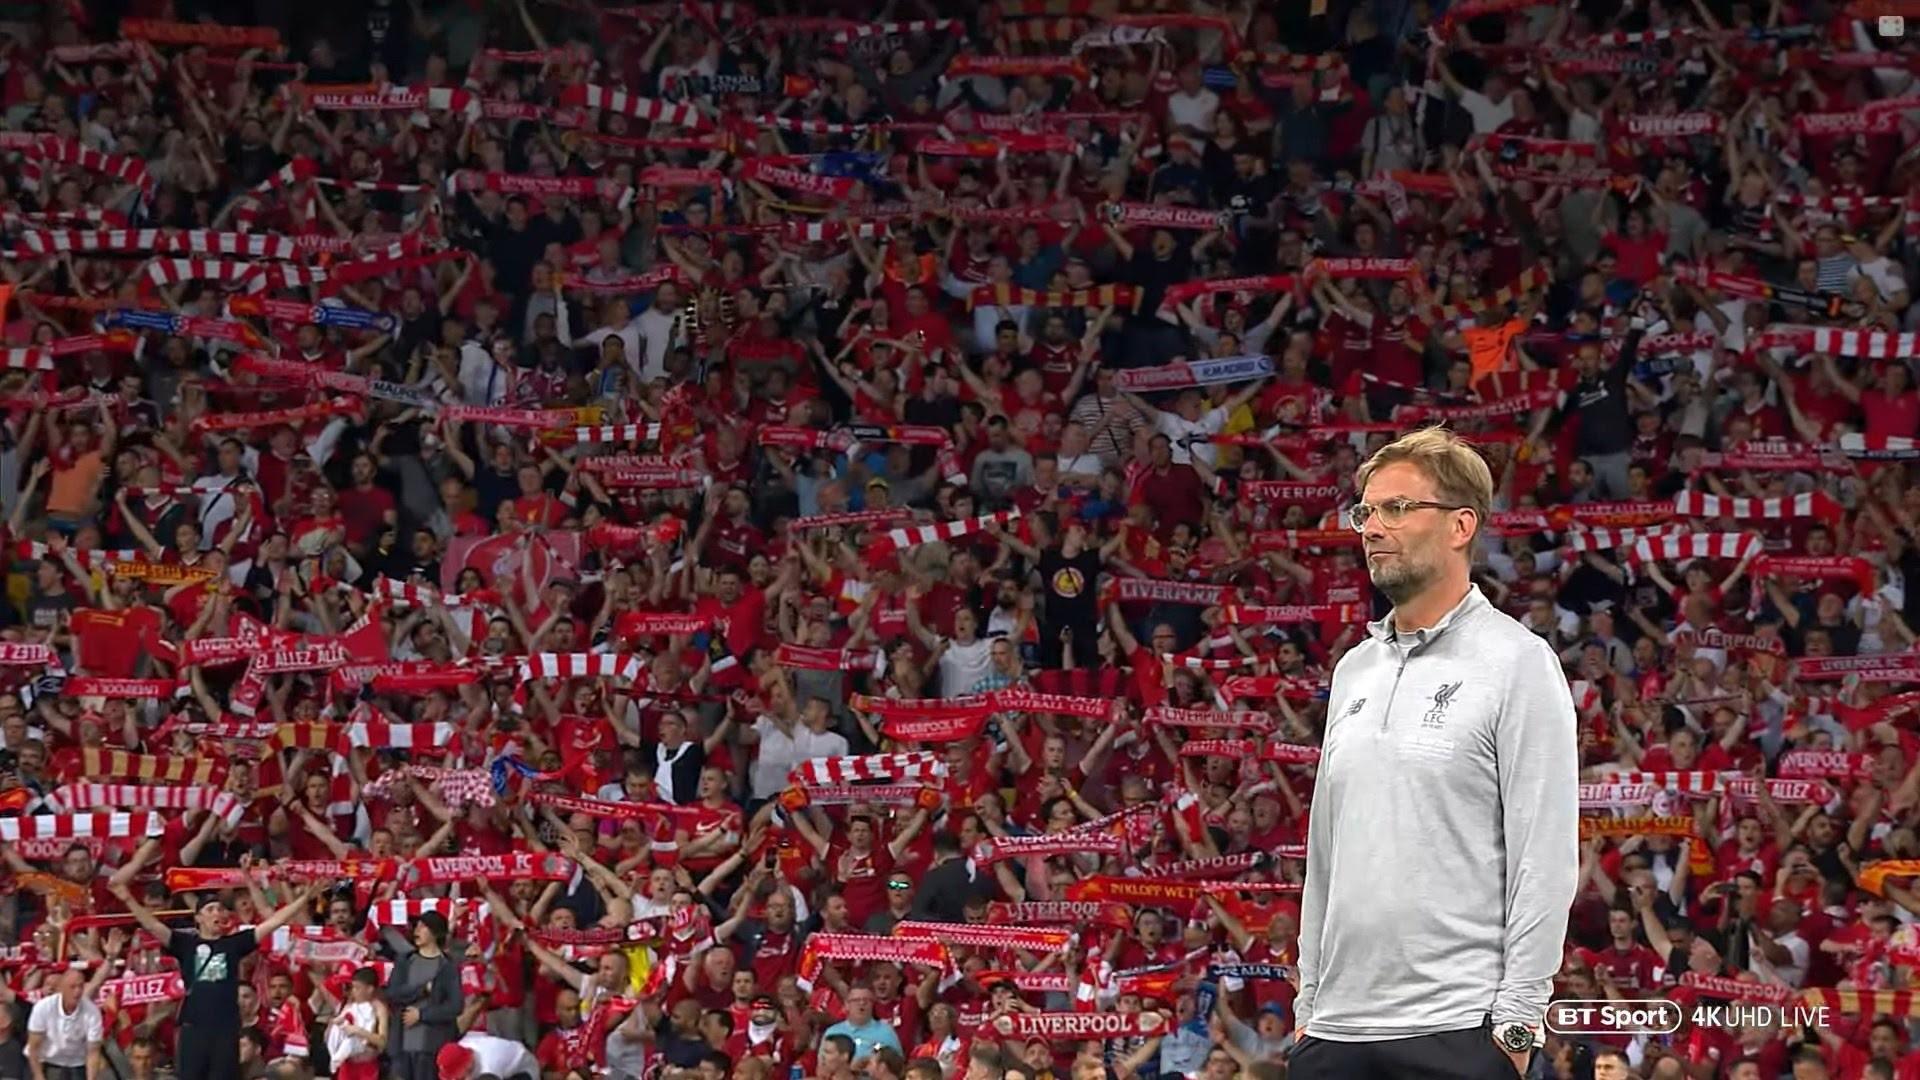 Liverpool Champions League Wallpaper 1920x1080